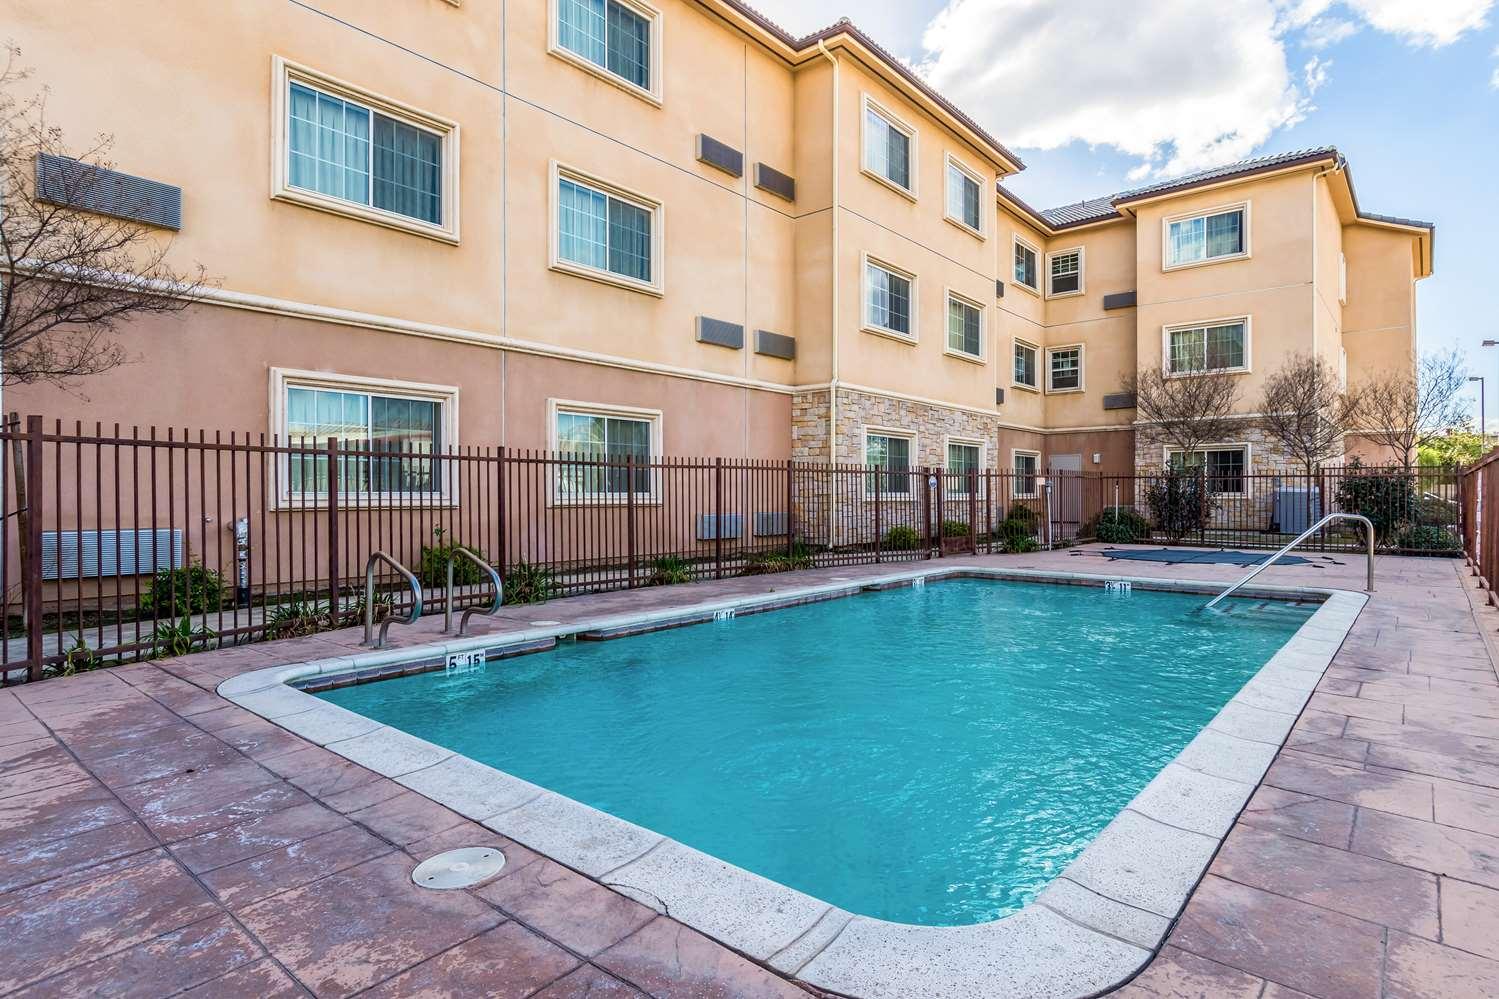 Pool - Studio 6 Extended Stay Hotel Bakersfield